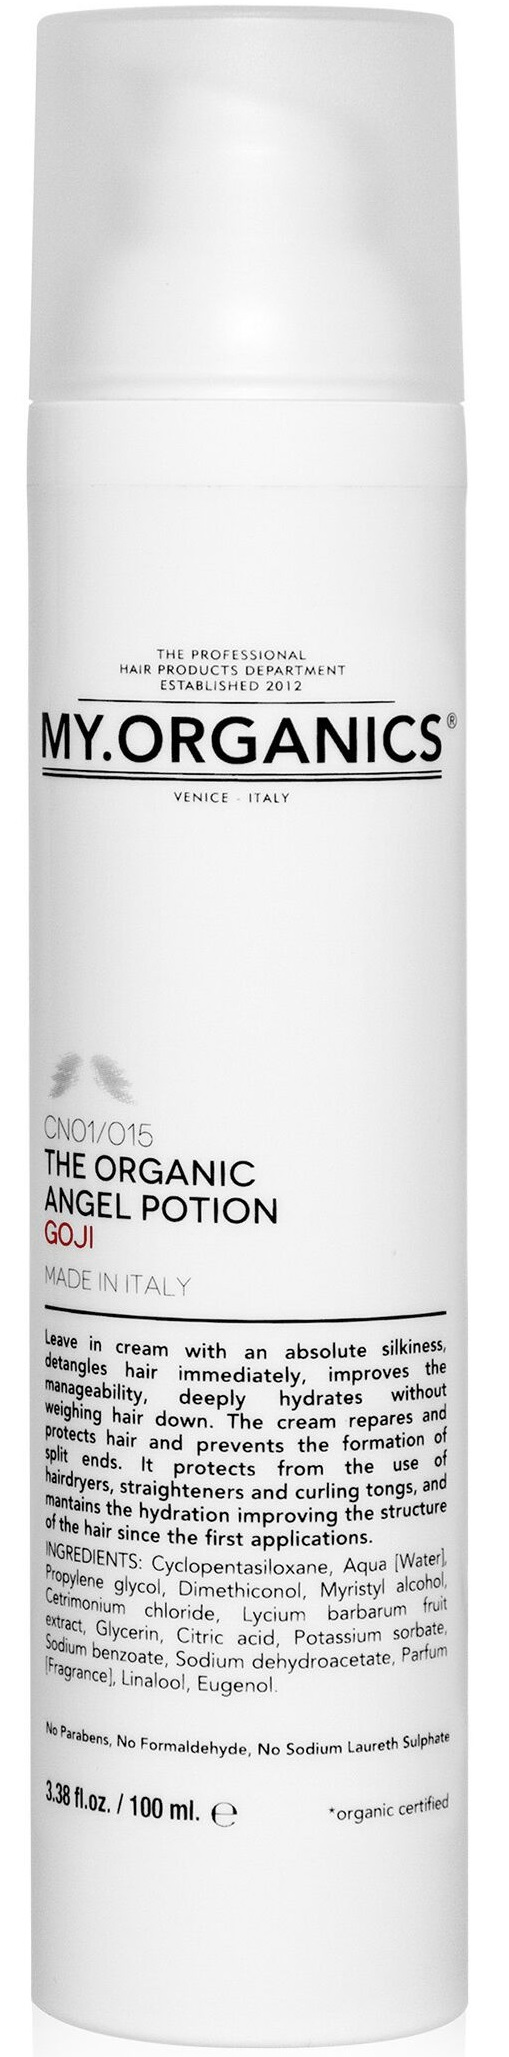 MY.ORGANICS The Organic Angel Potion Goji 100ml